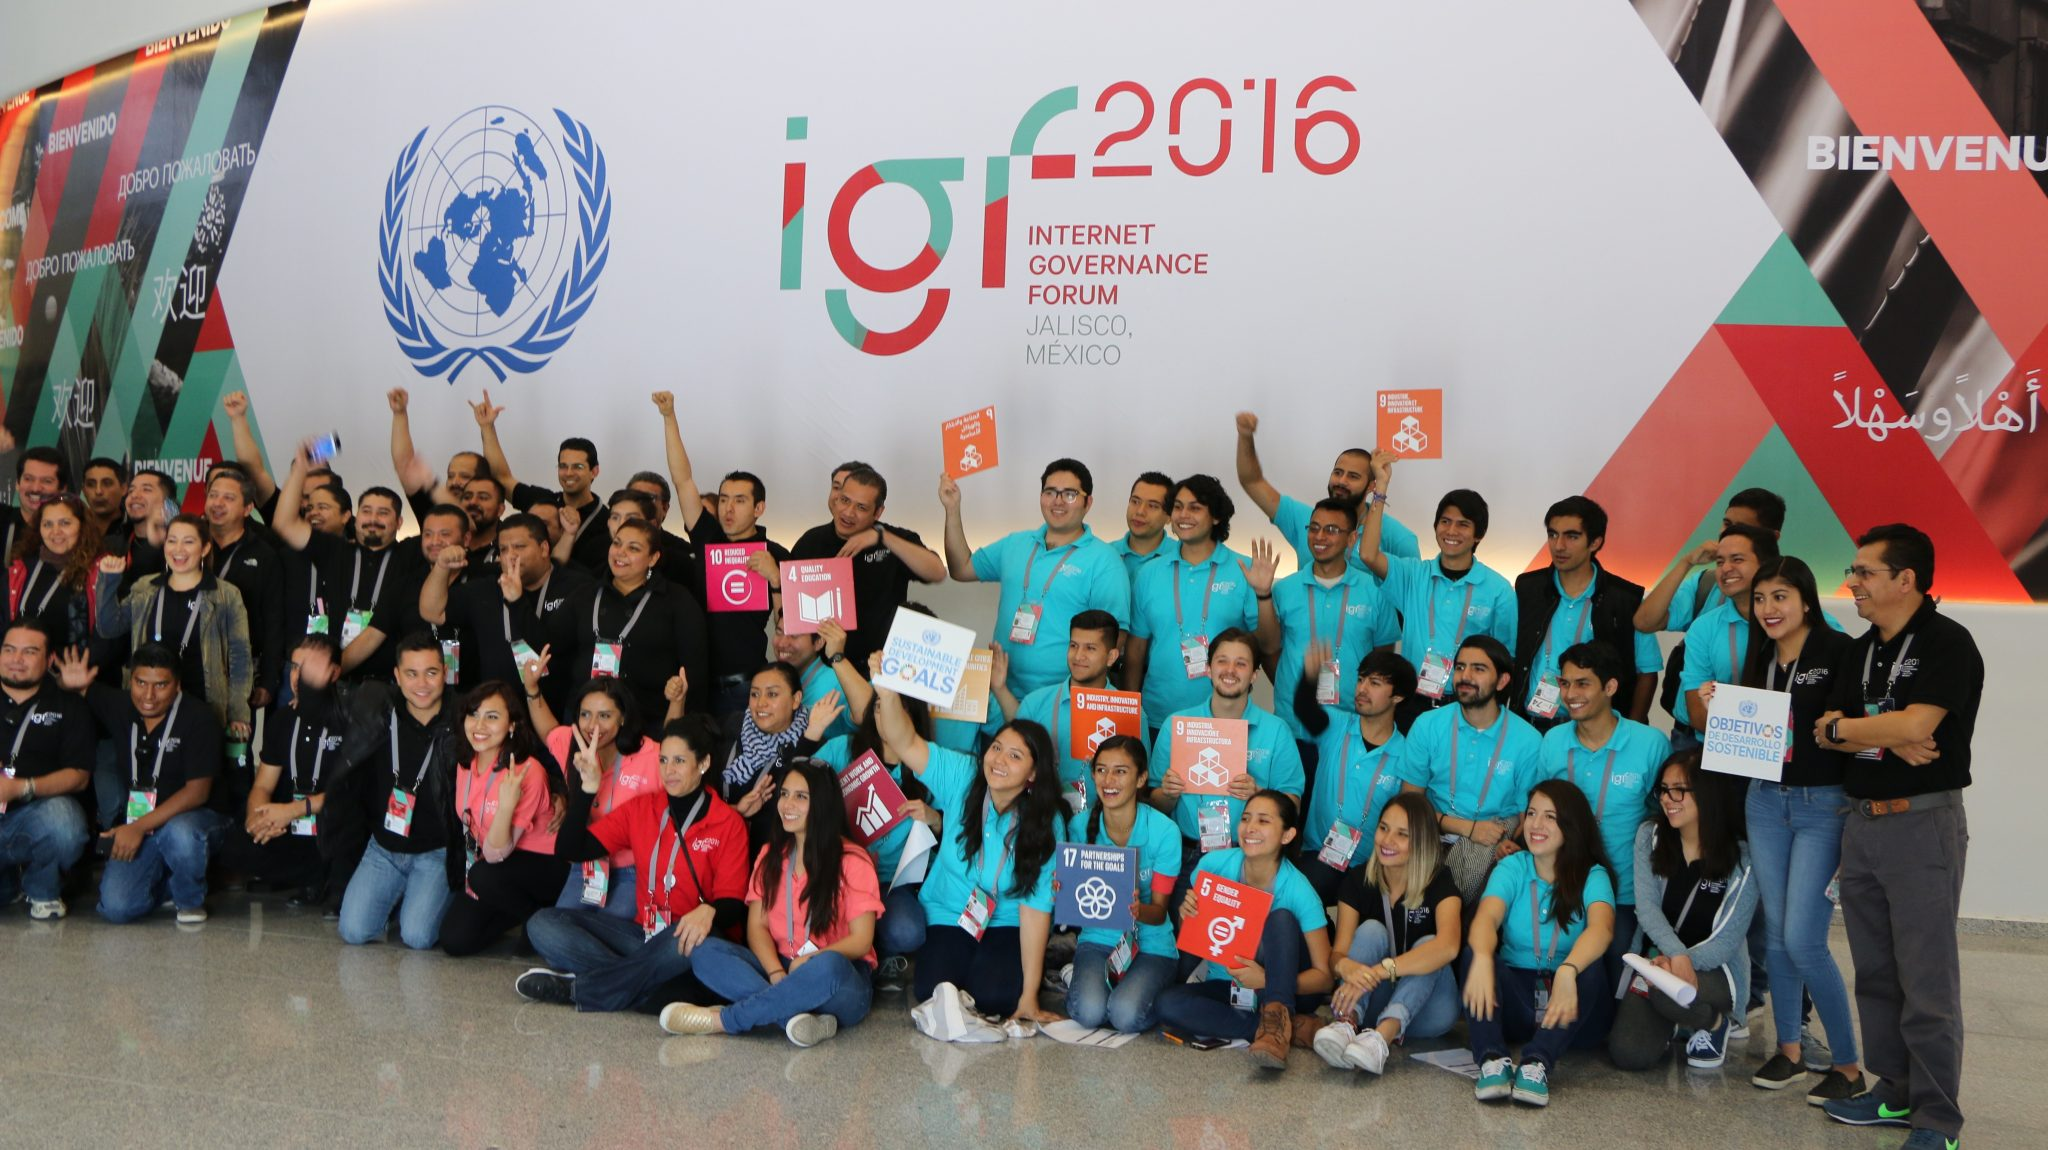 Sustainable Development Goals 17 Goals To Transform Our World